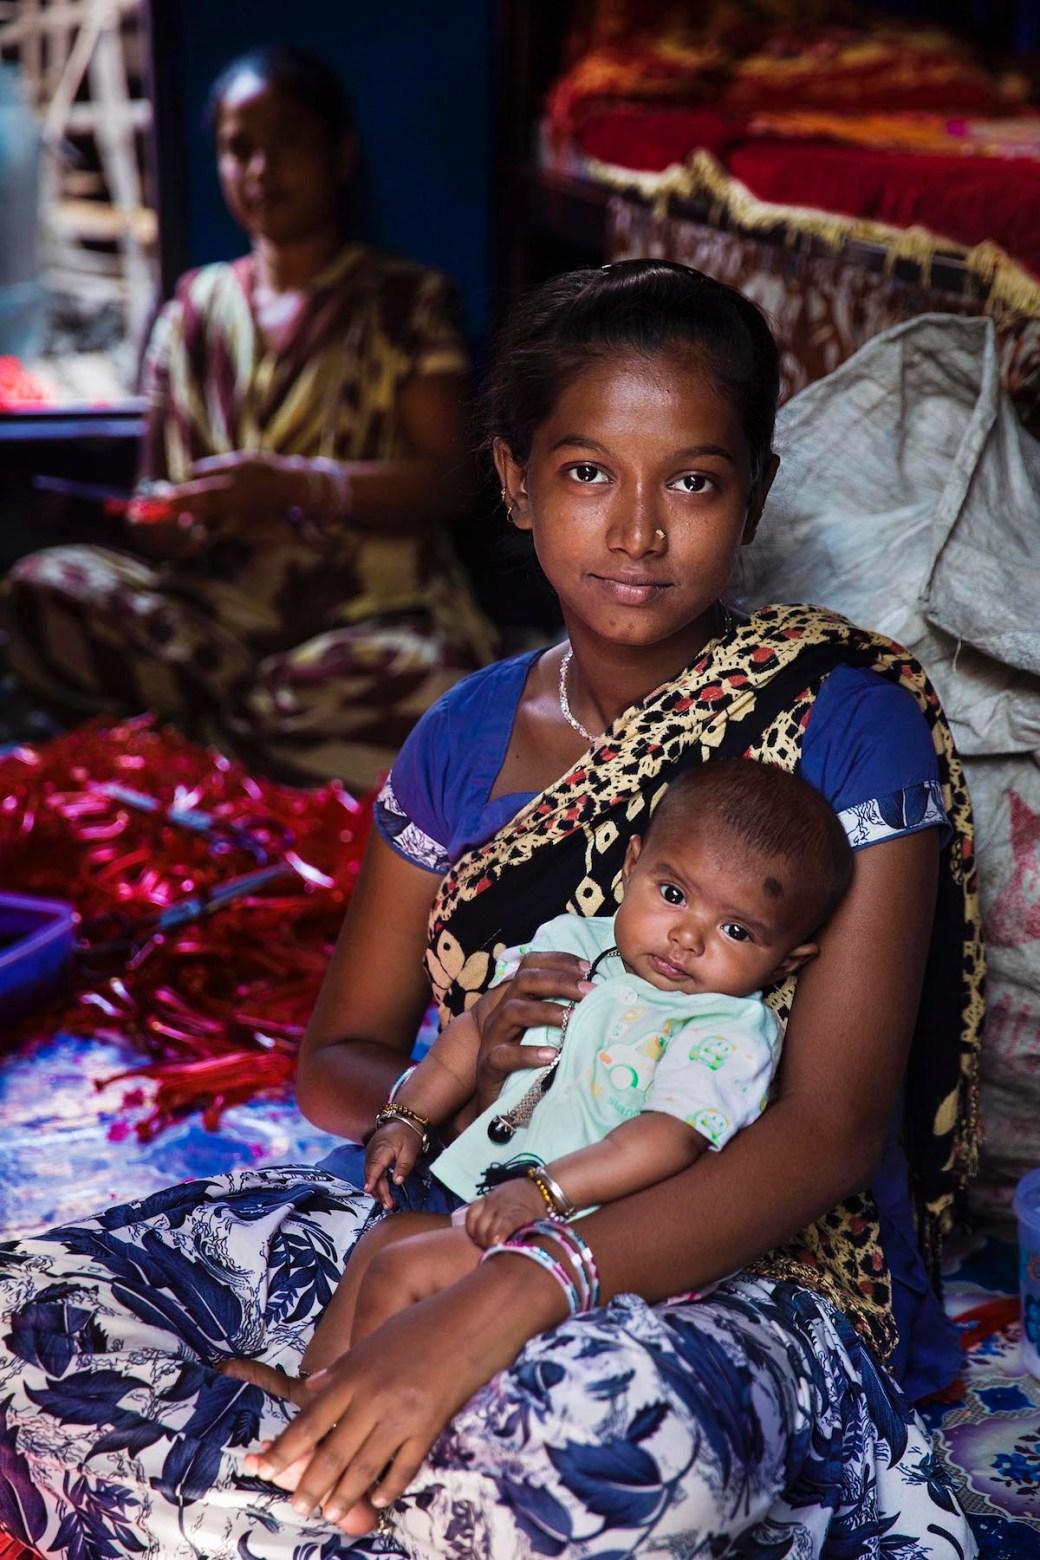 Bangladeshi woman and her daughter in Kolkata